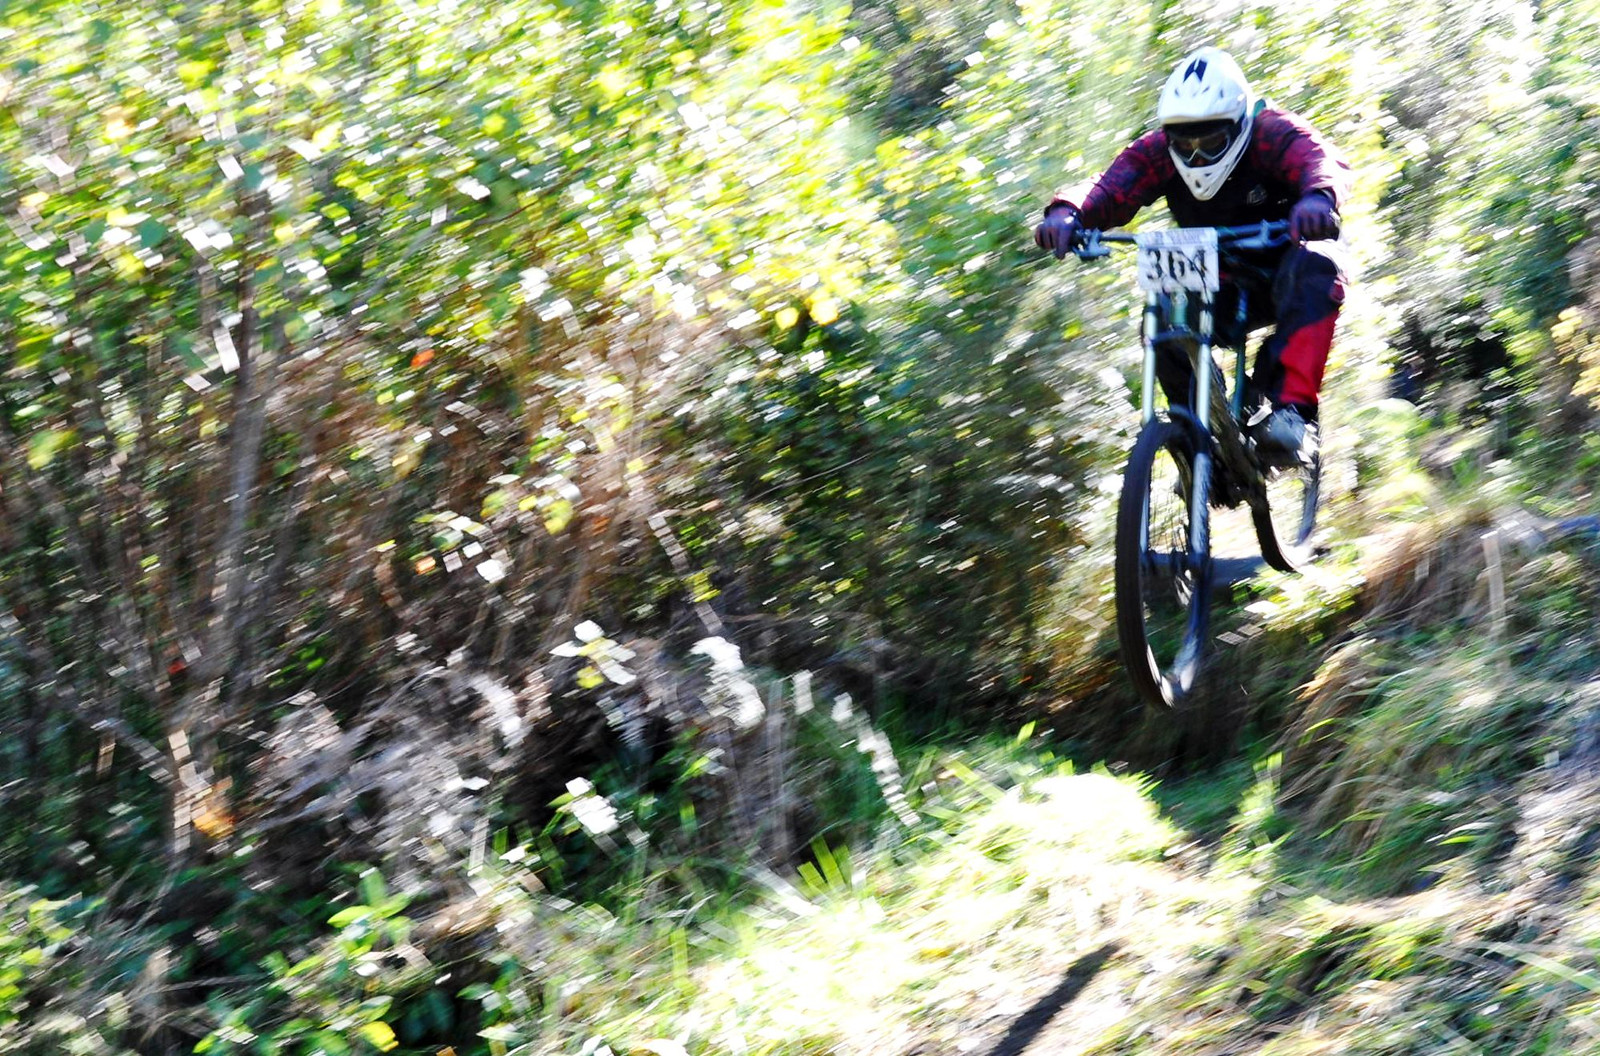 Broken Axe - Adam_Mitchell - Mountain Biking Pictures - Vital MTB